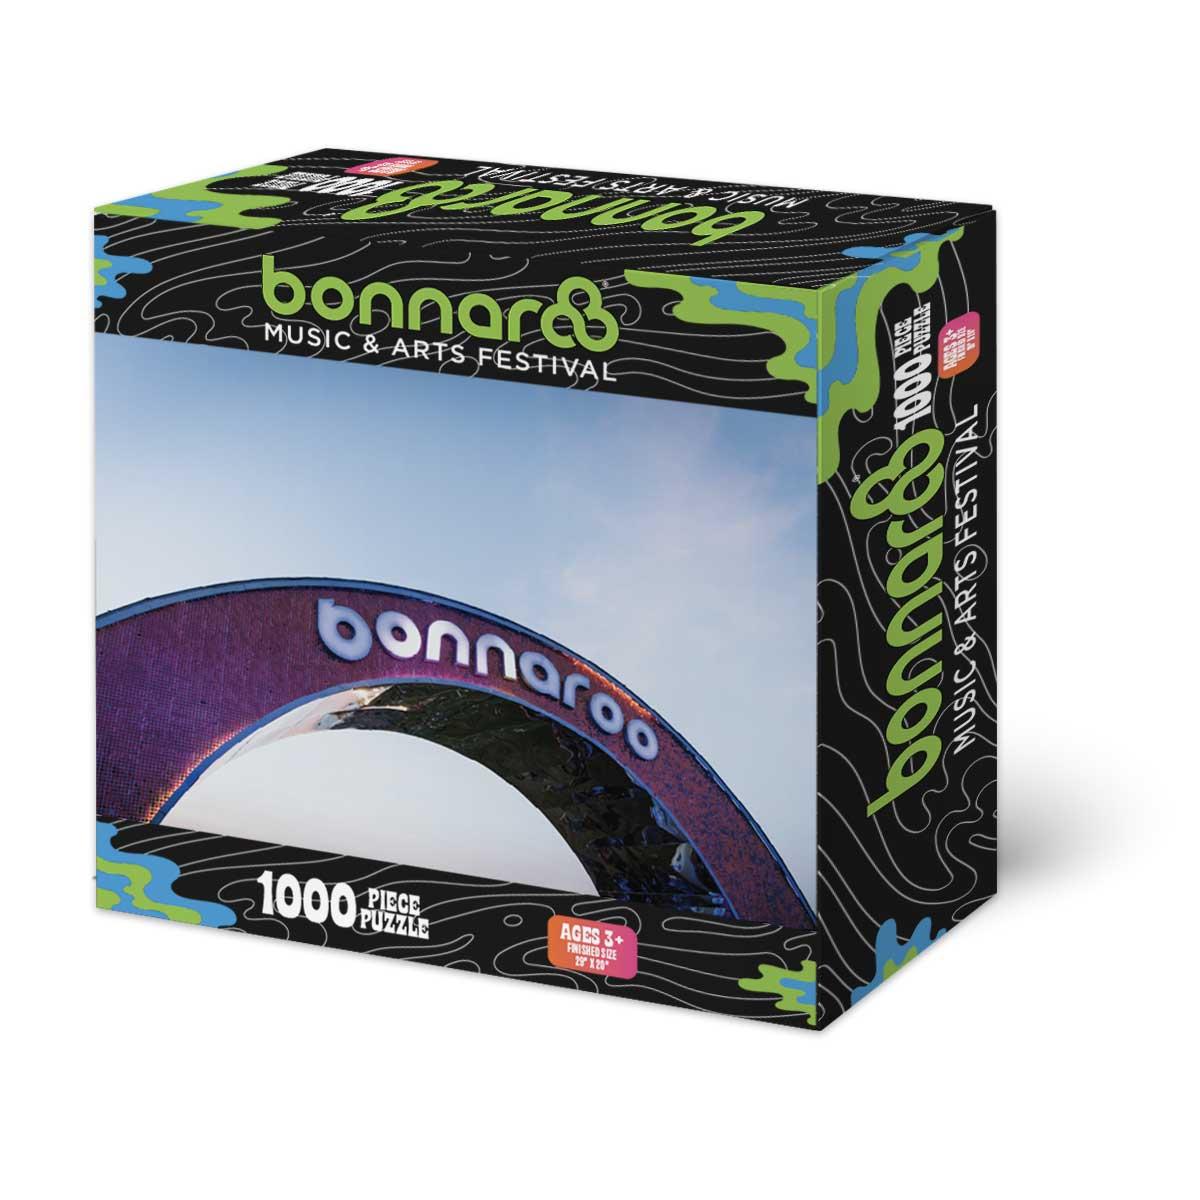 Bonnaroo Puzzle - 1000 pc